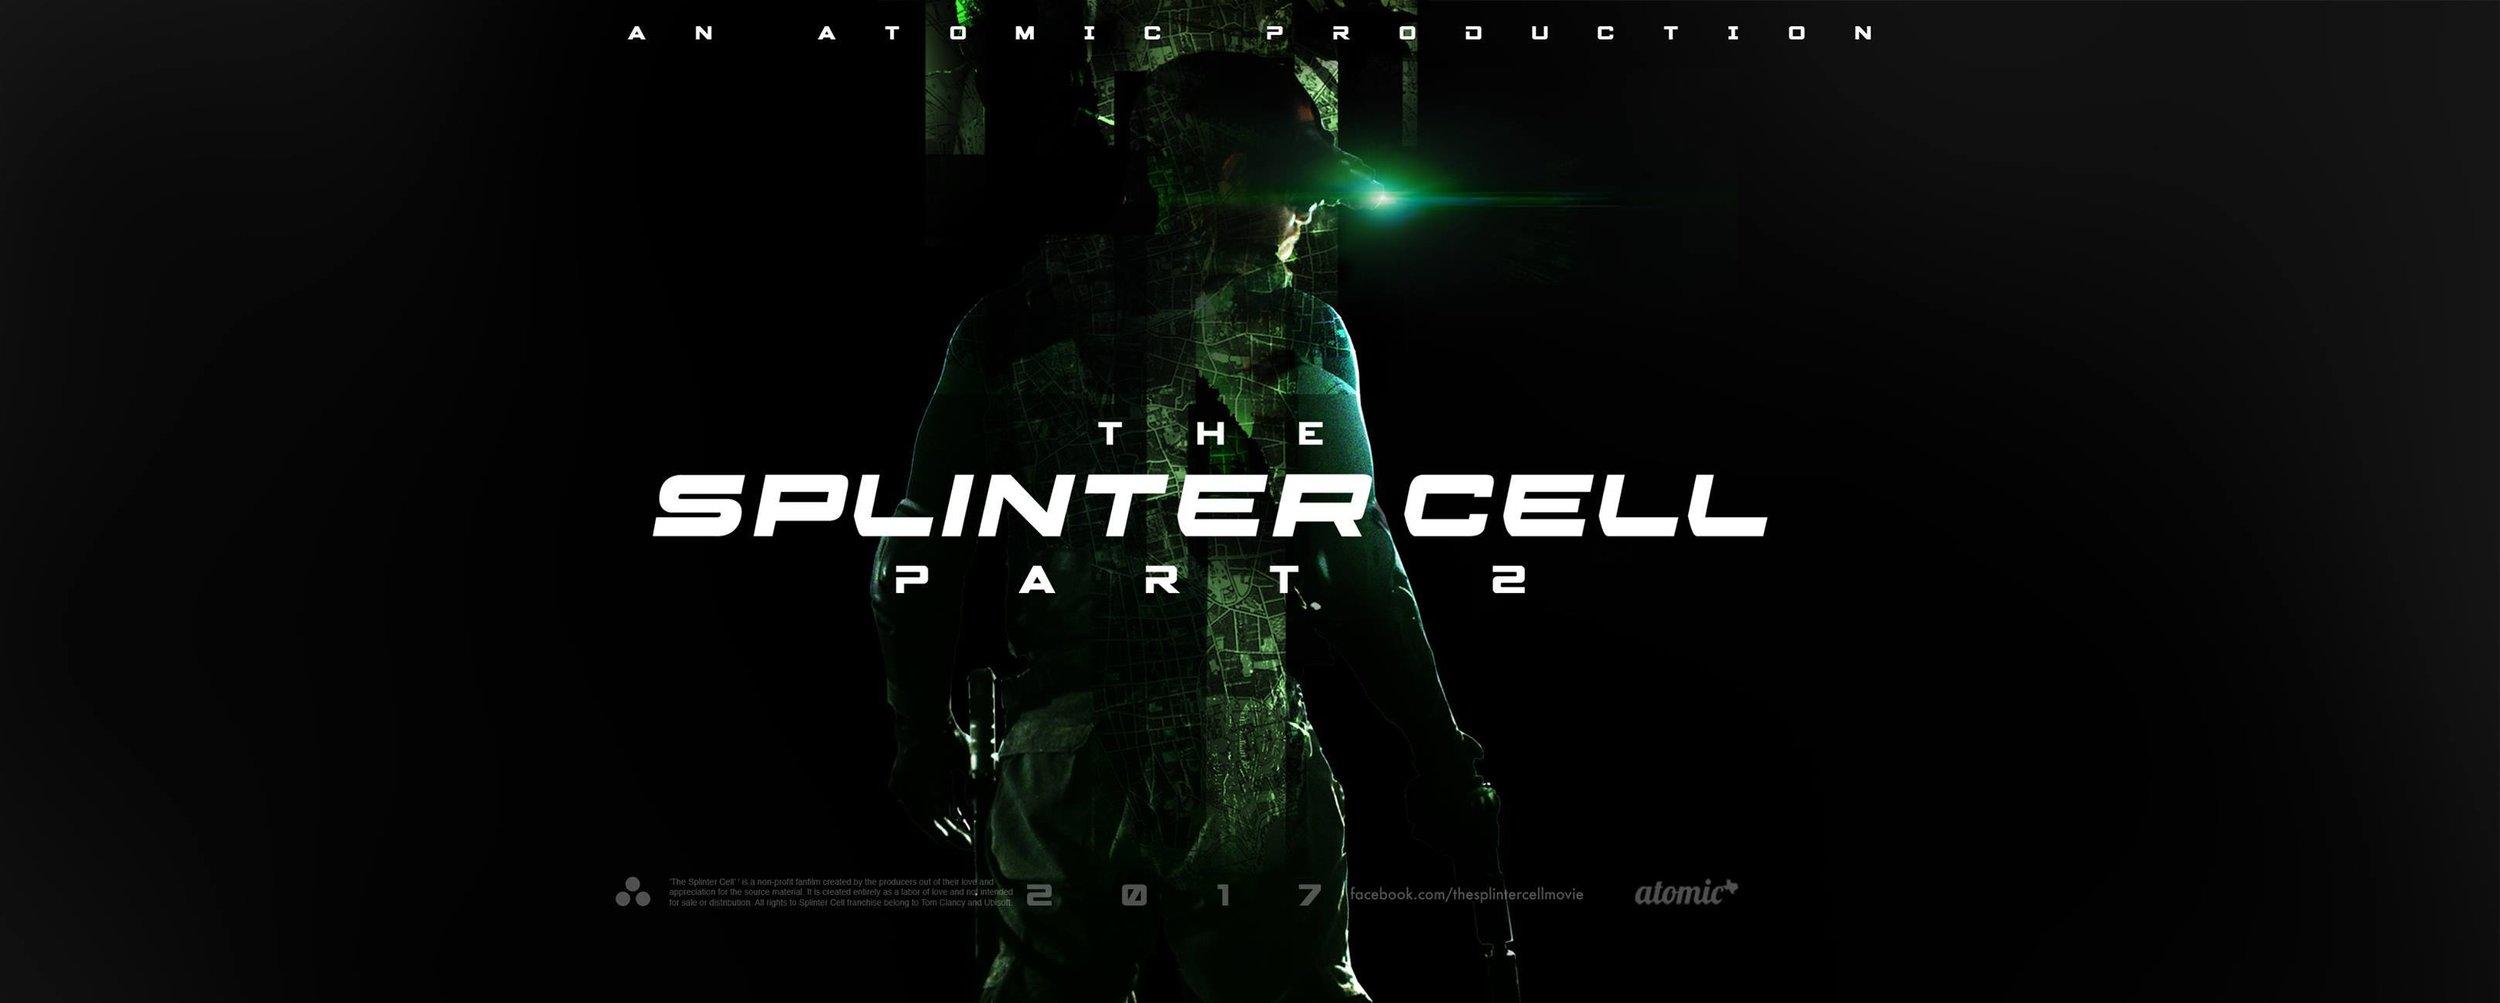 splinter-cell-part-2-banner.jpg